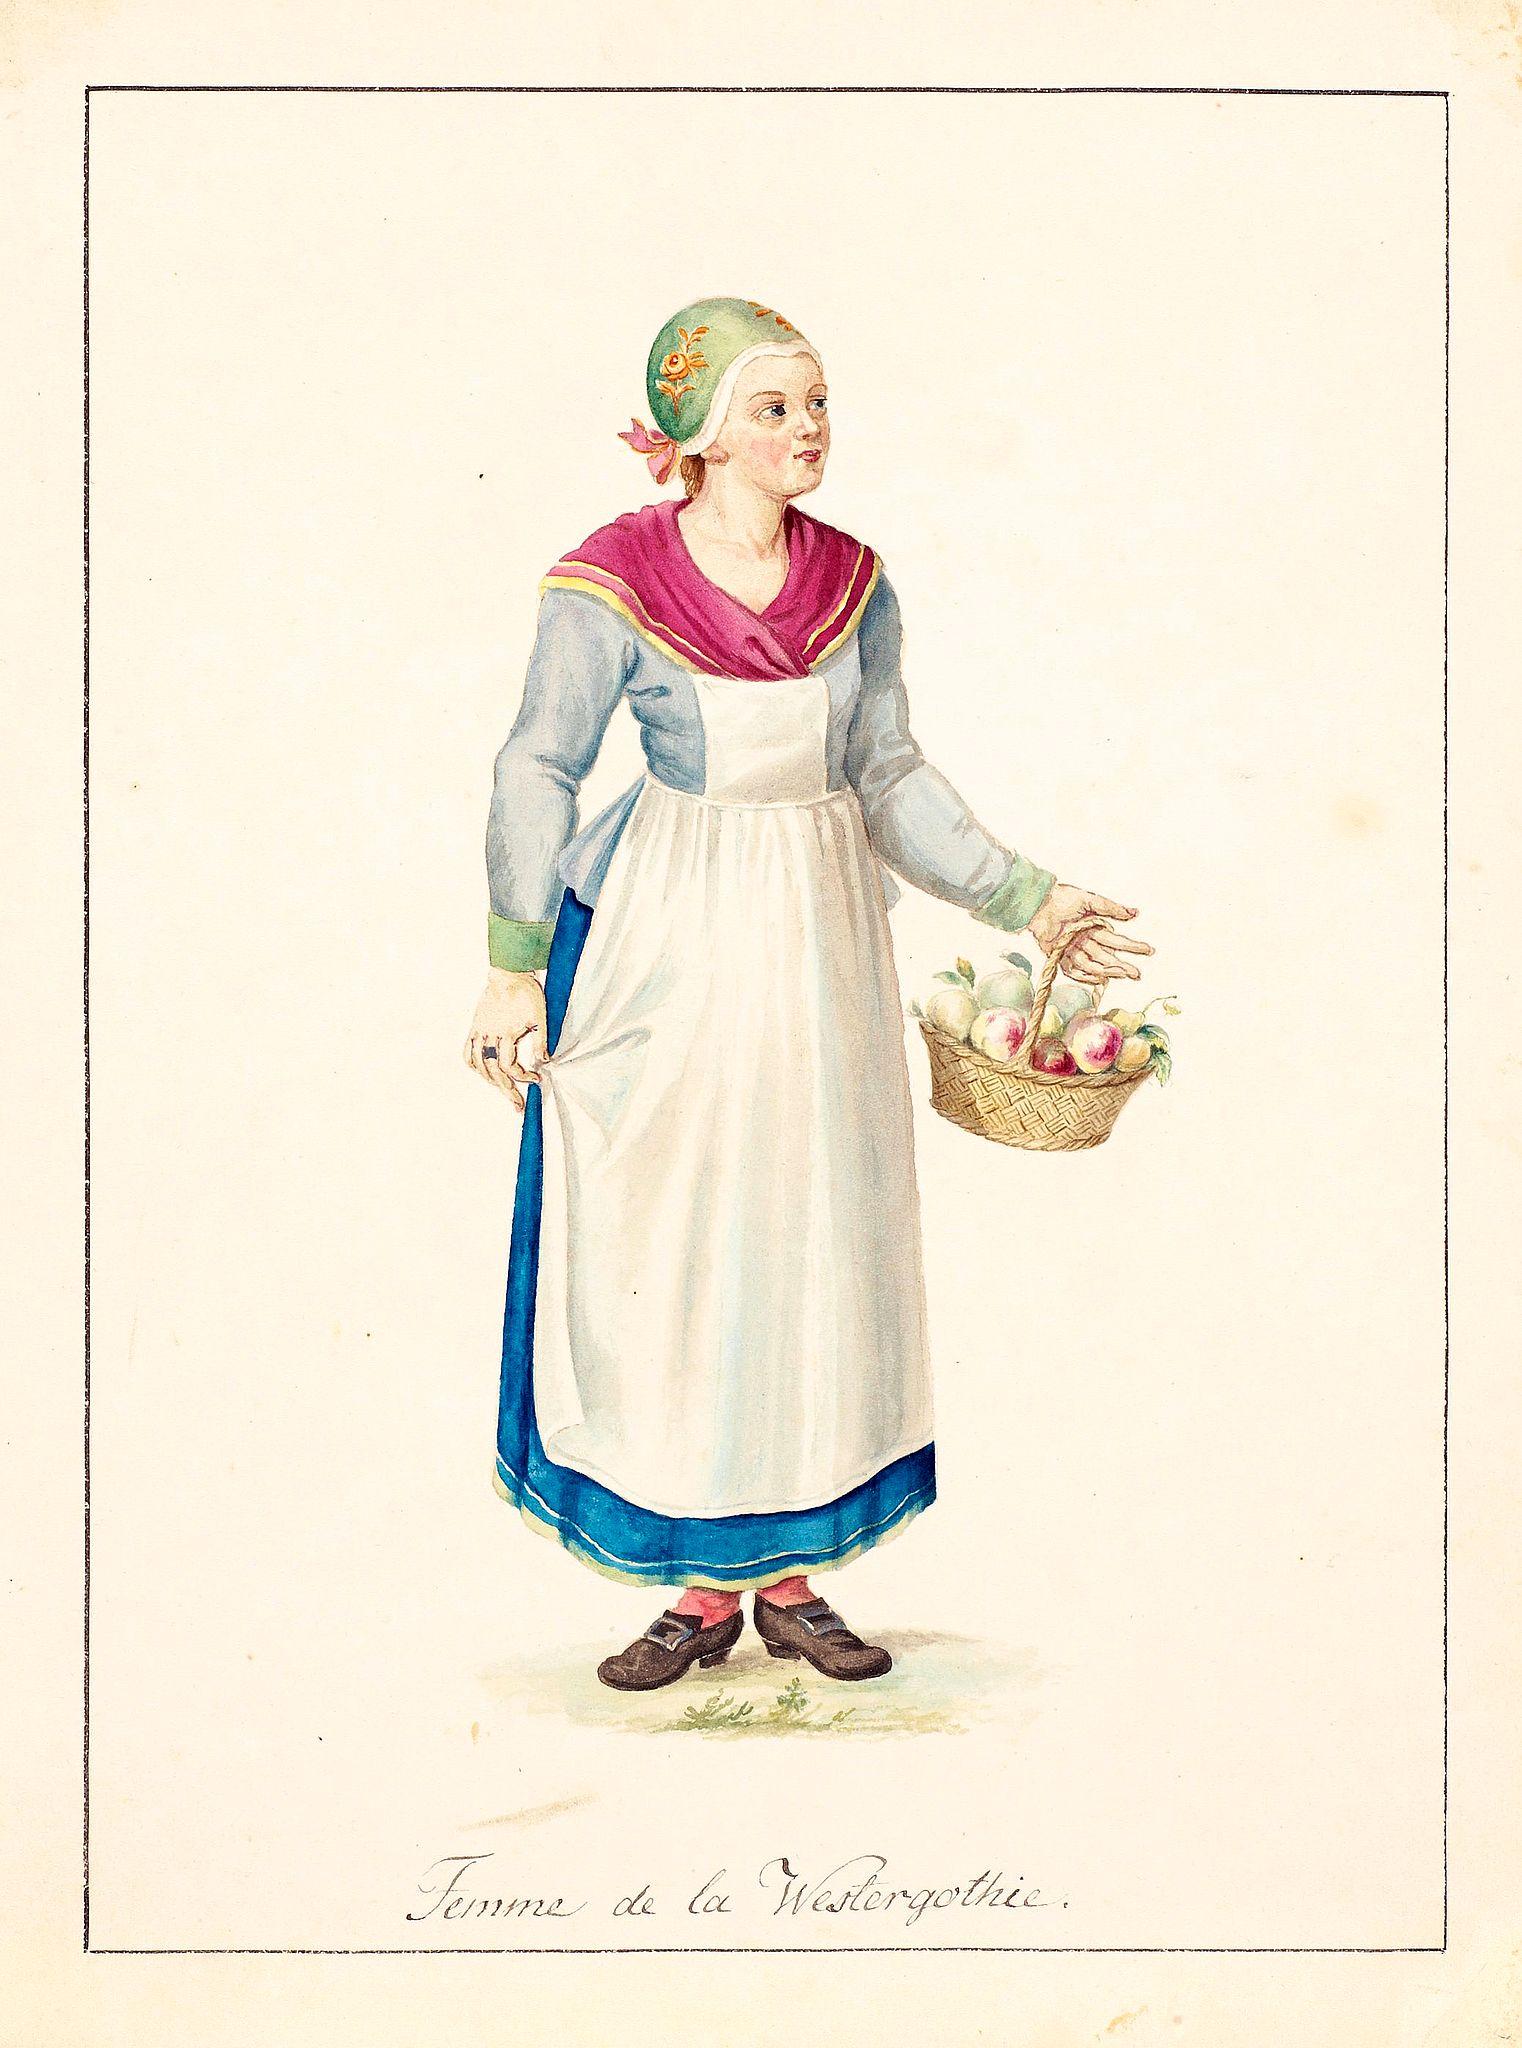 SWEDMAN, C.W. attributed to -  Femme de la Westergothie.